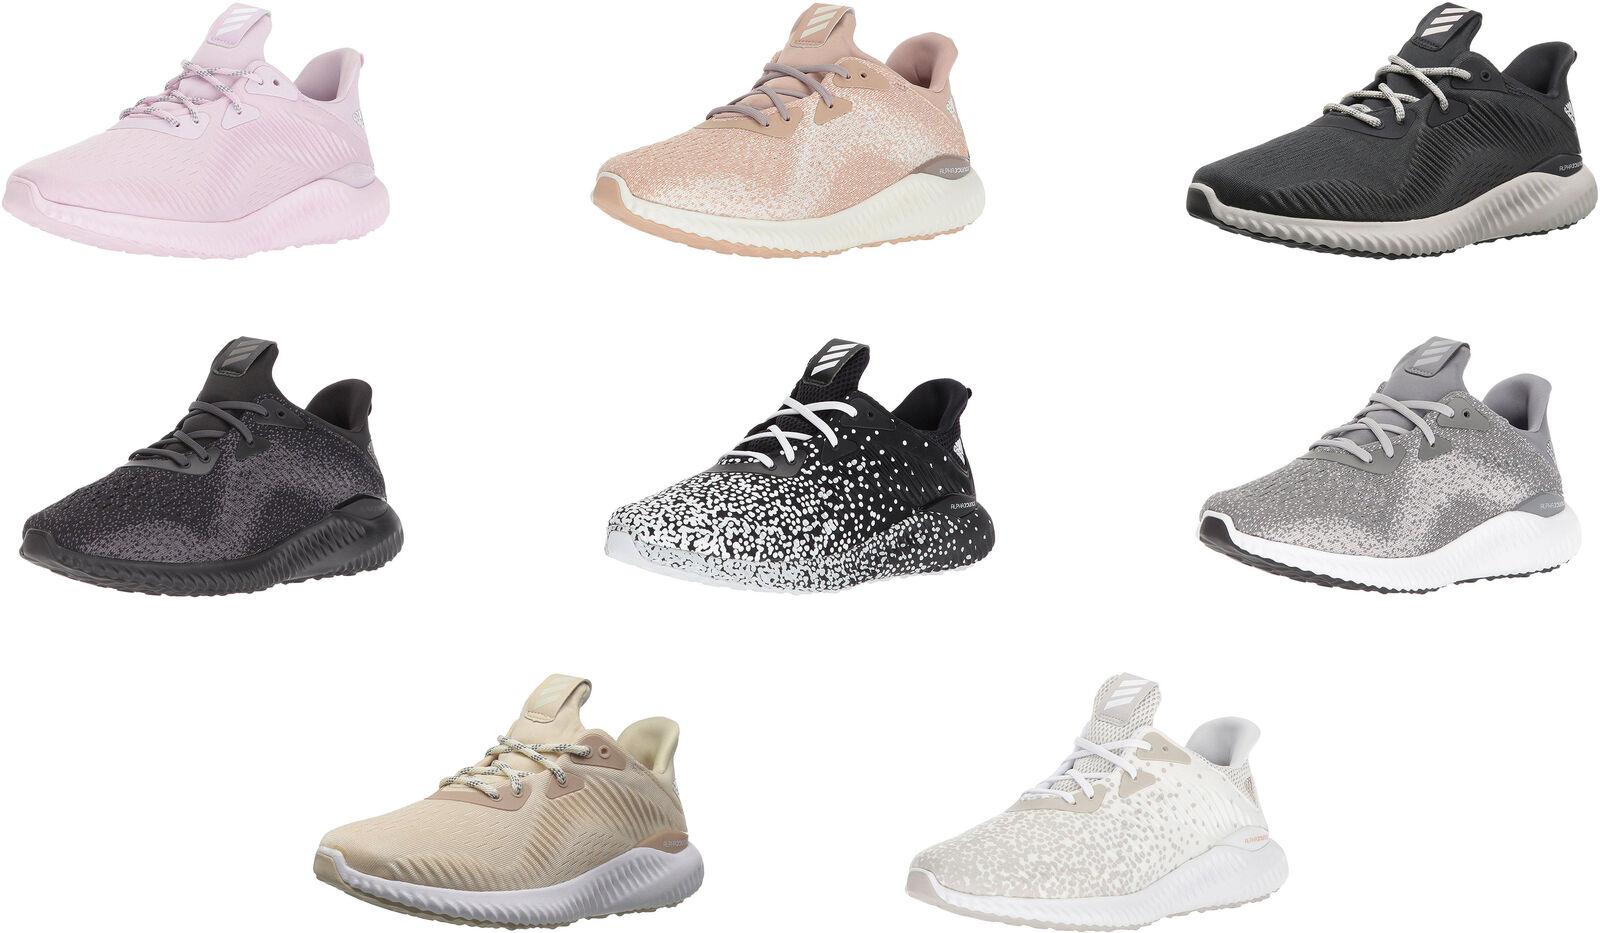 Adidas Women's Alphabounce 1 shoes, 8 colors